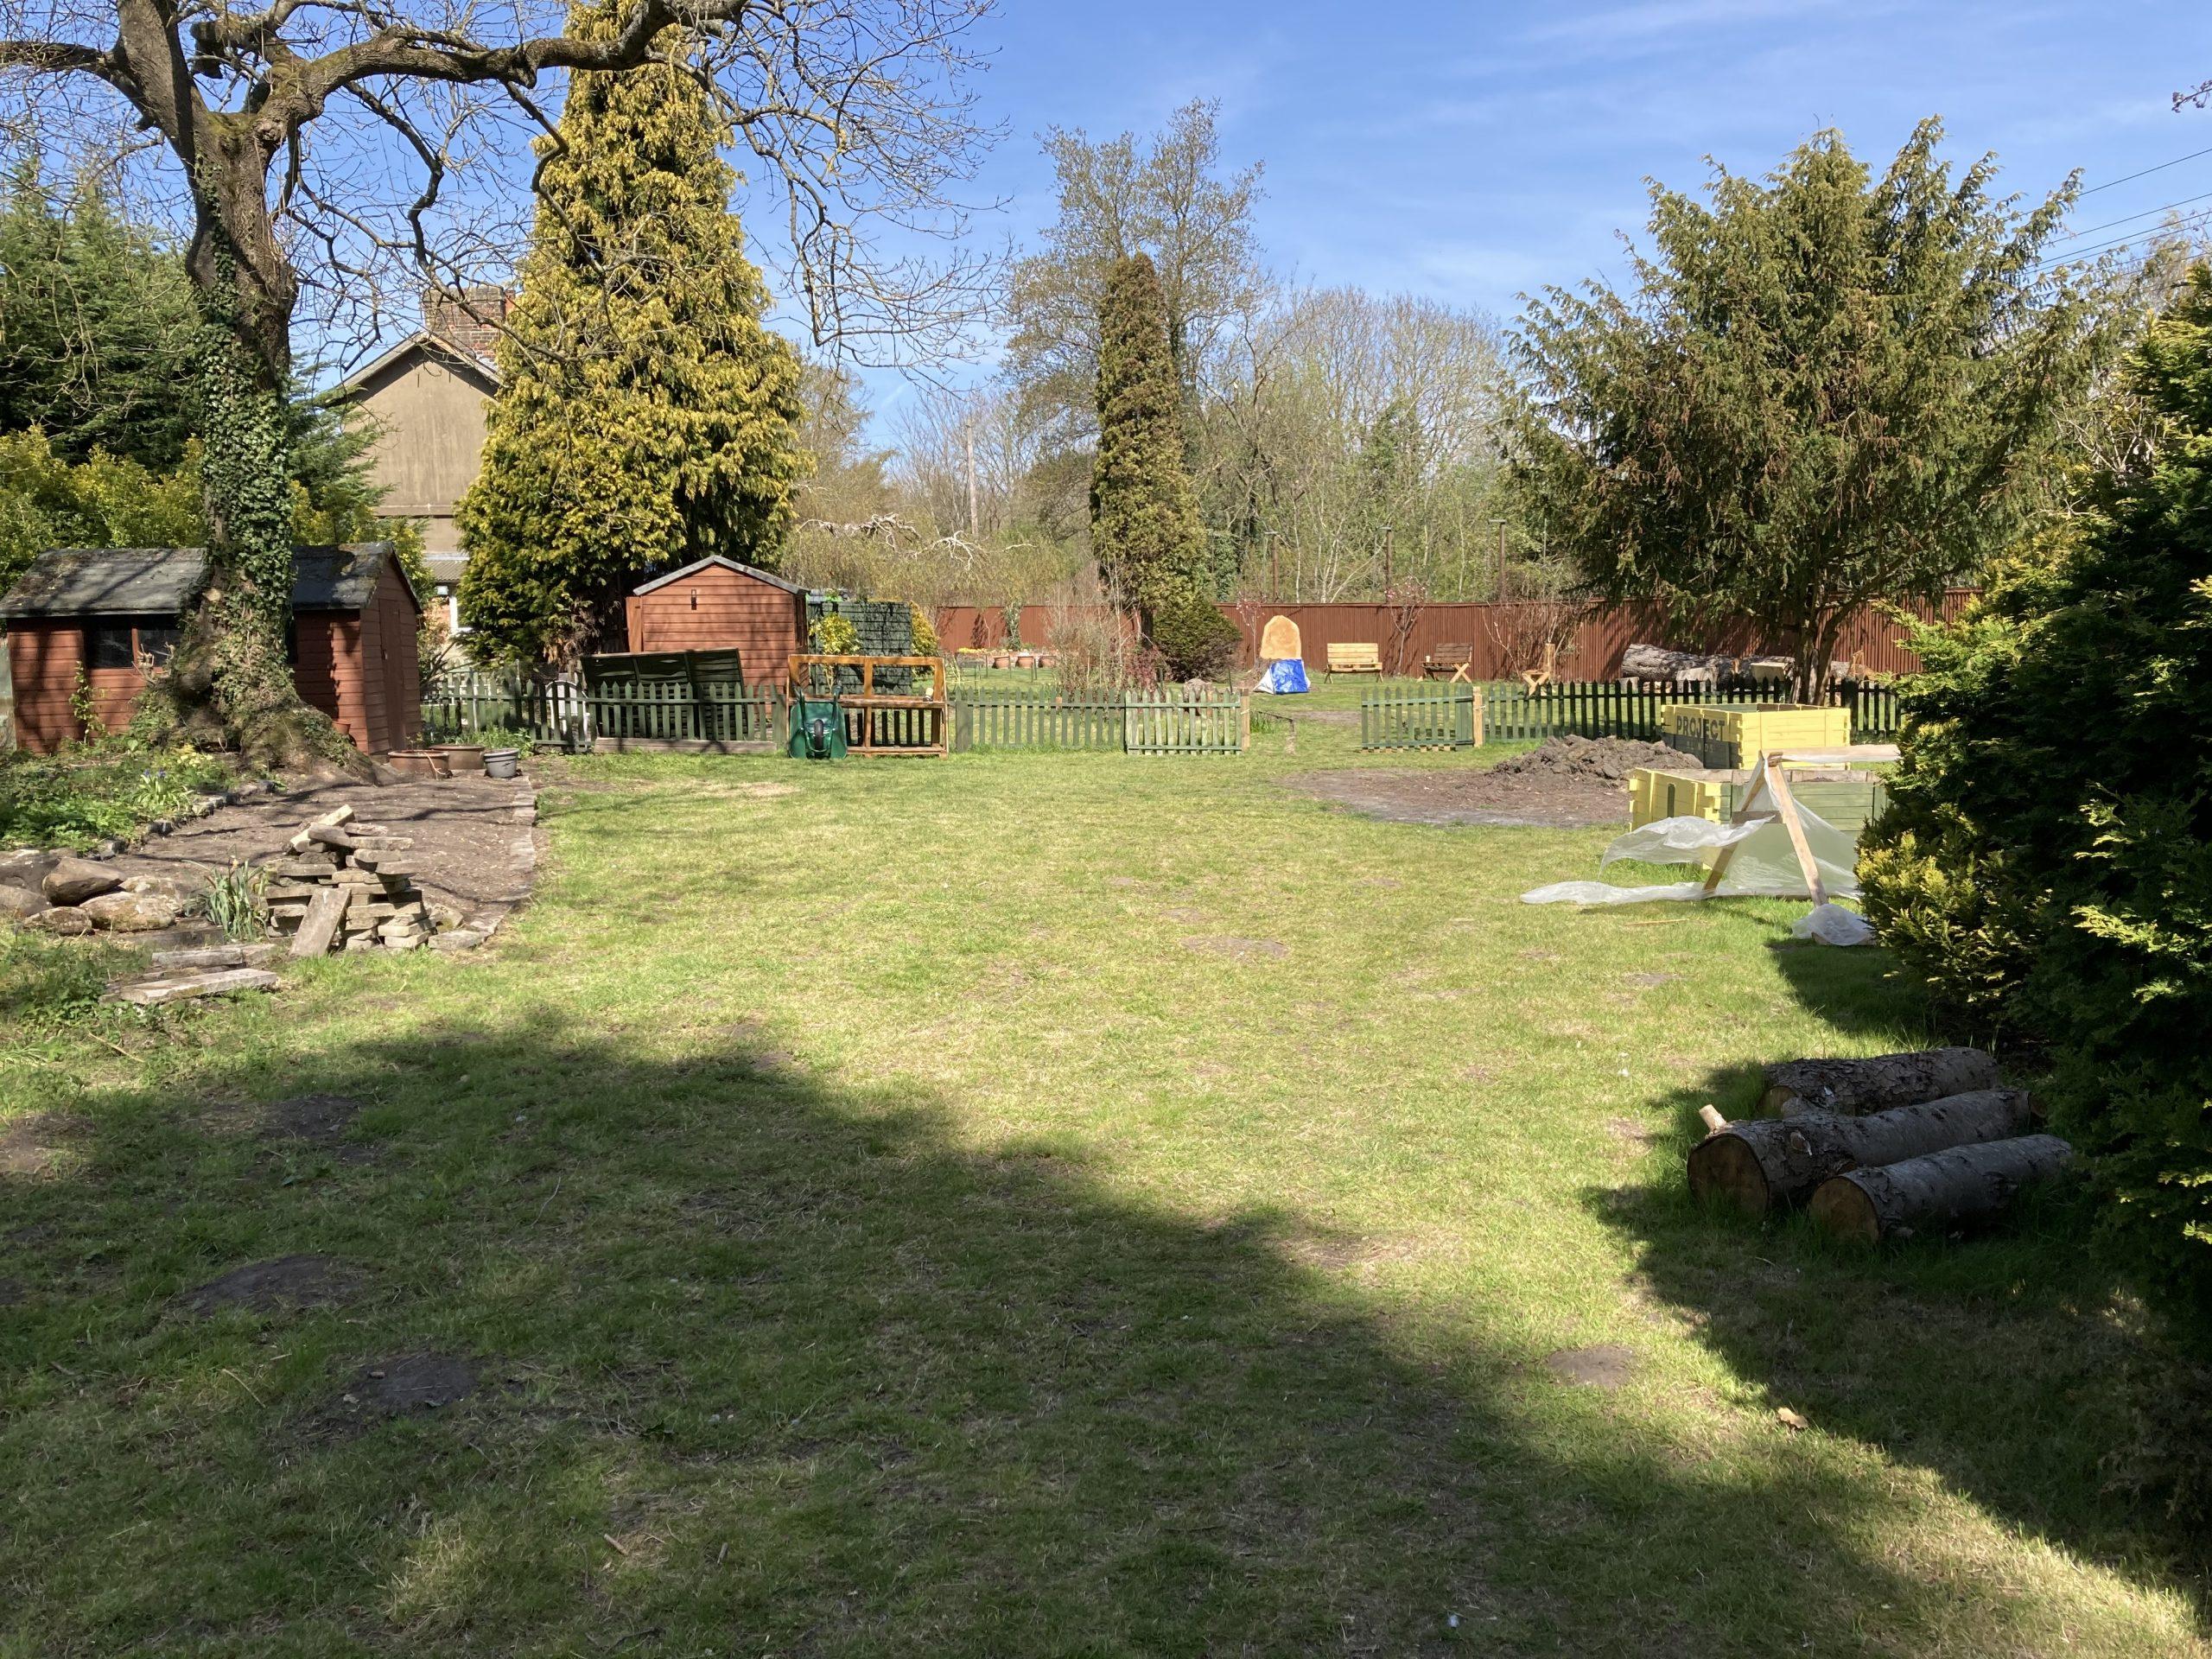 Spring has sprung in Reg's Garden